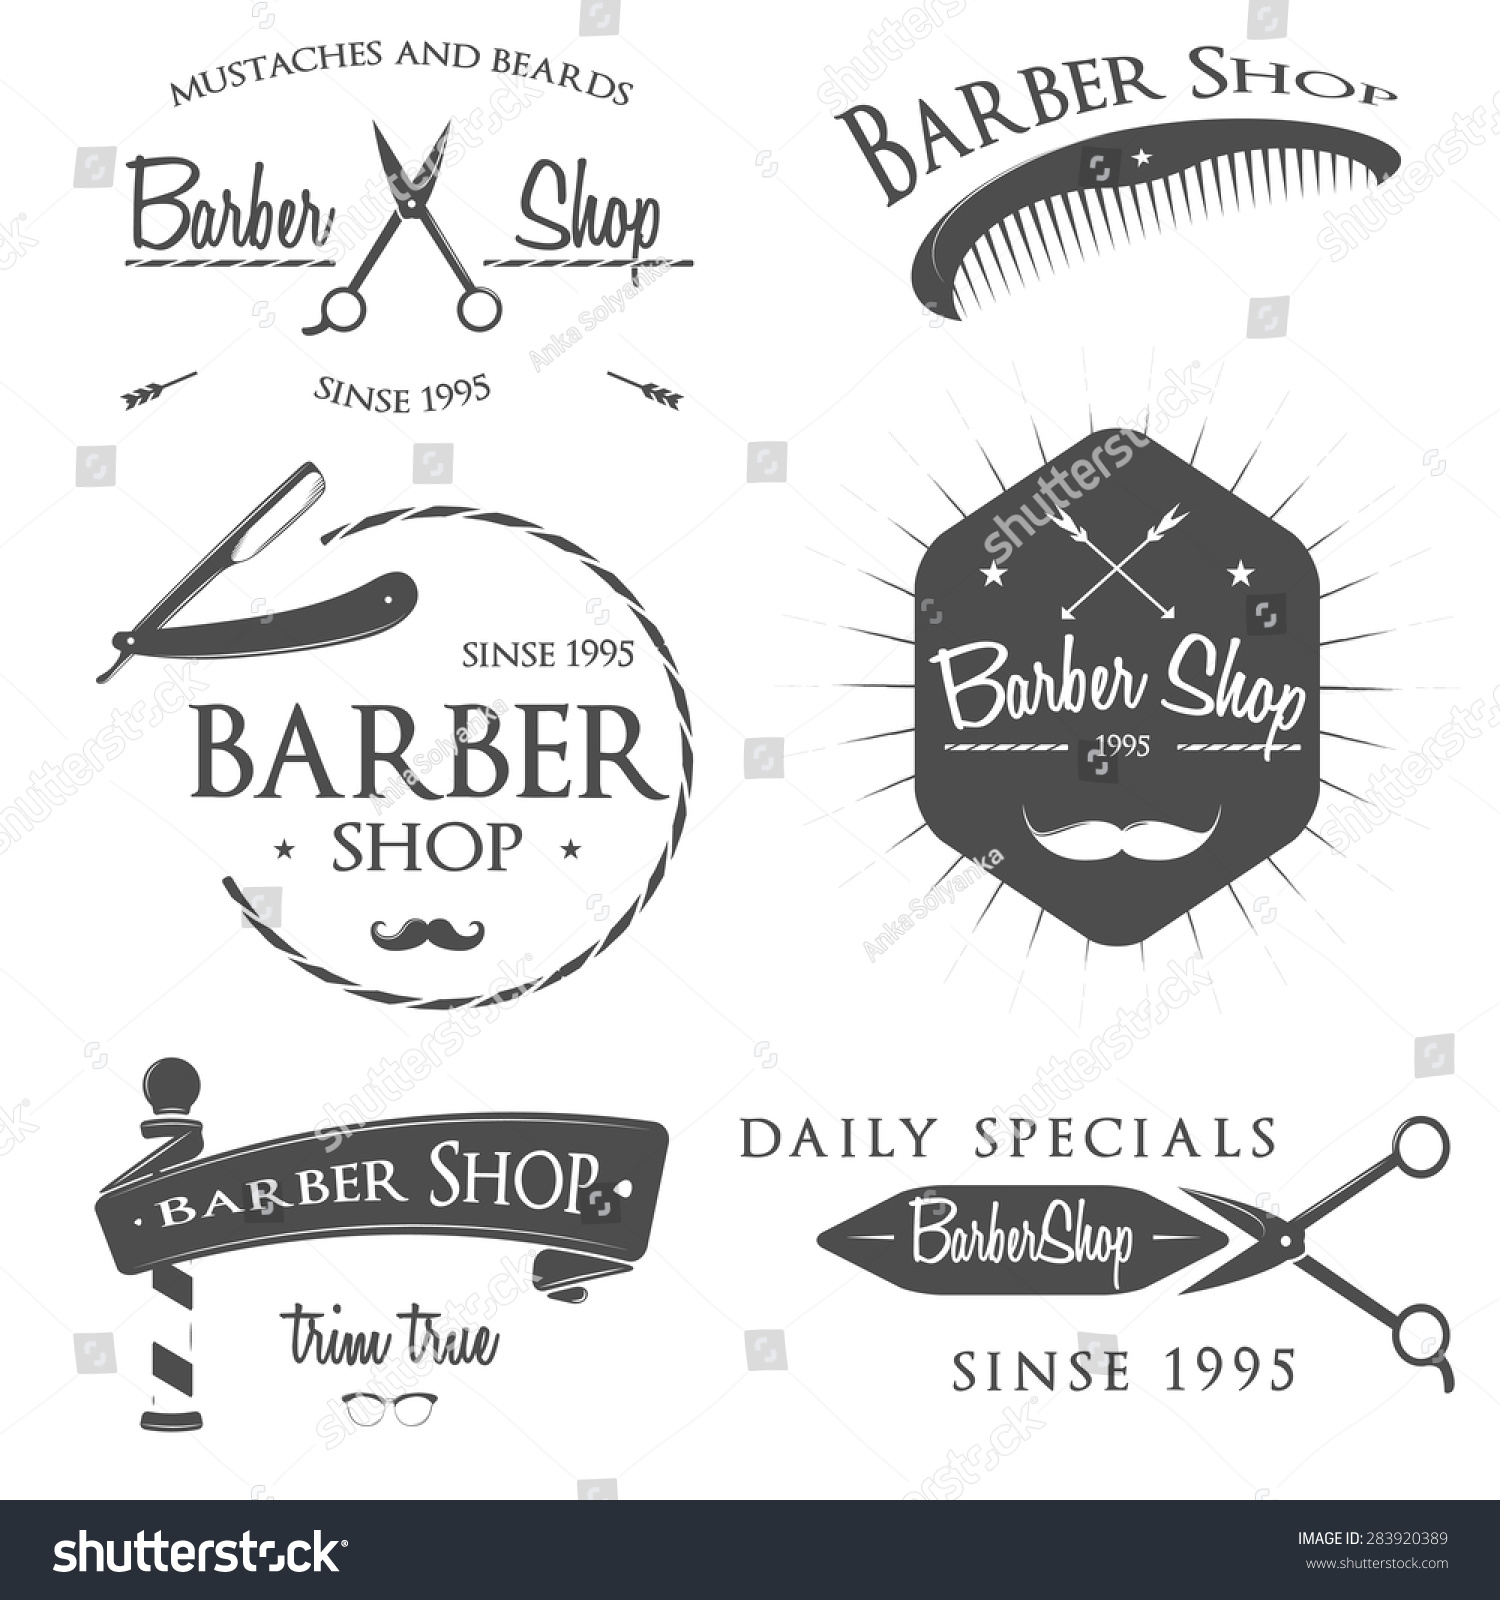 Clip art vector of vintage barber shop logo graphics and icon vector - All Images Photos Vectors Illustrations Footage Music Vintage Barber Shop Logo Set Badges And Design Element Gentleman Set Icons For